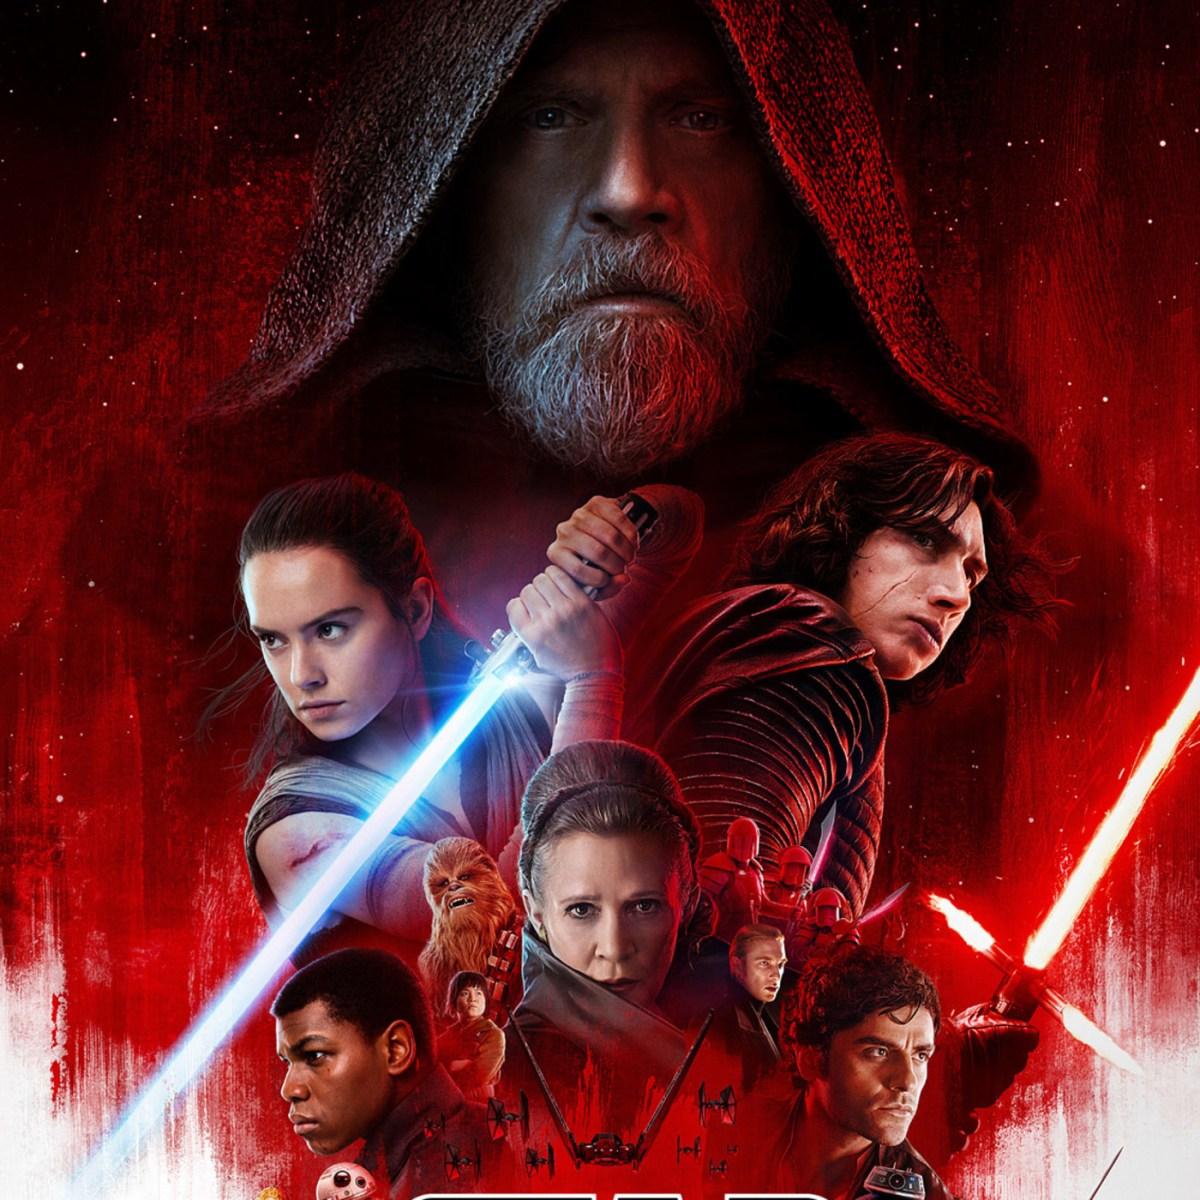 Ep 18 Star Wars: The Last Jedi